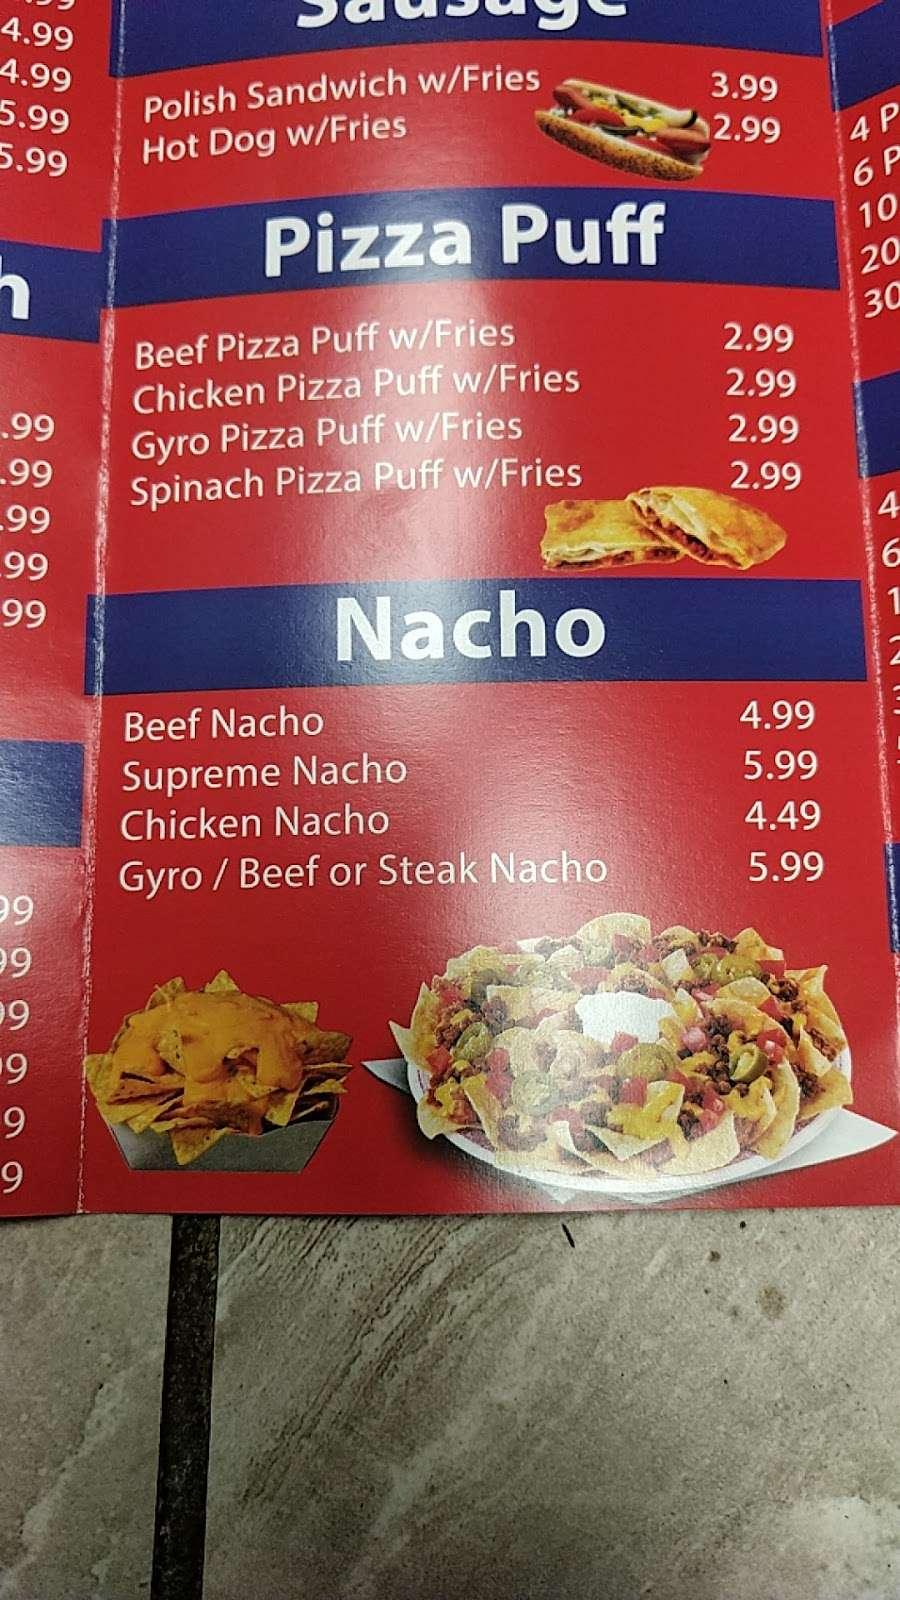 Tasty Chicken & Salad - restaurant  | Photo 8 of 10 | Address: 159 W 95th St, Chicago, IL 60628, USA | Phone: (773) 840-3114